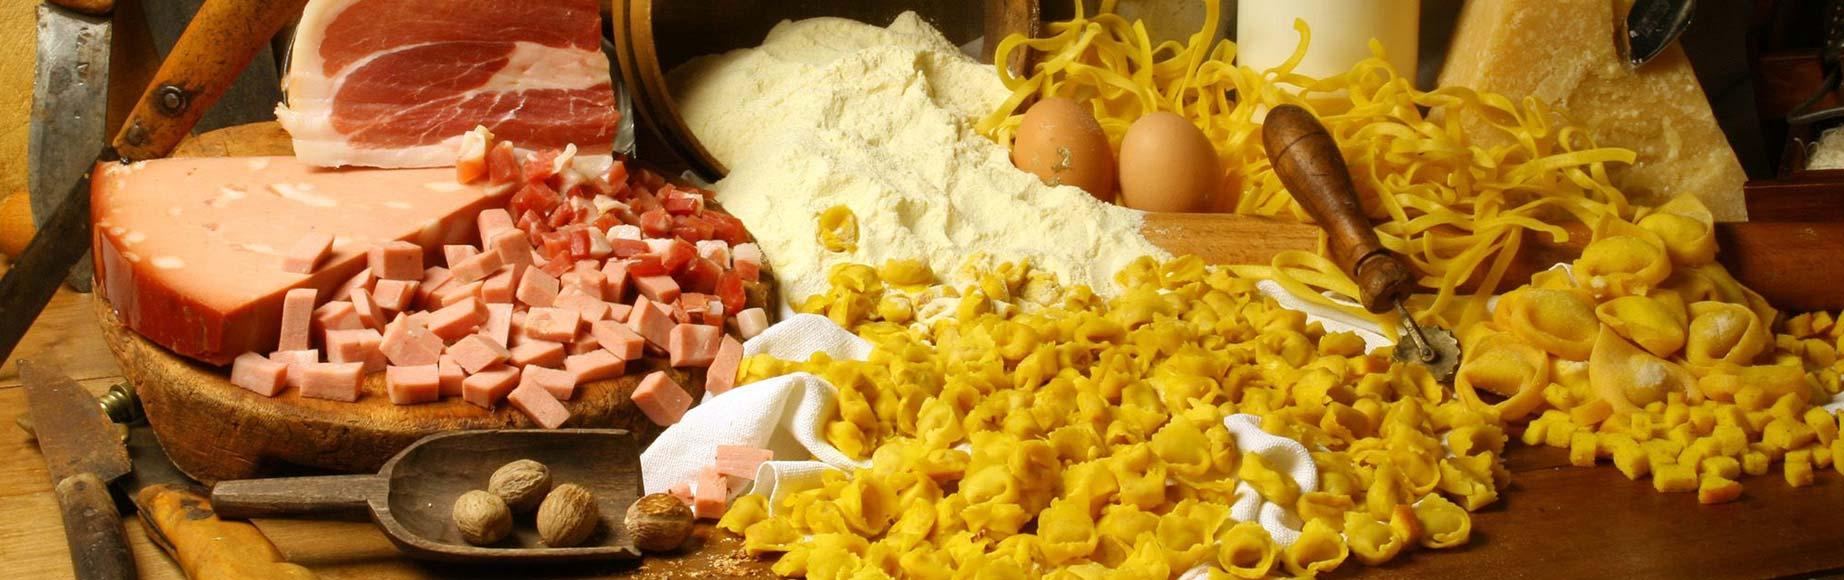 Albergo tre stelle cucina Romagnola patate arrosto piadina